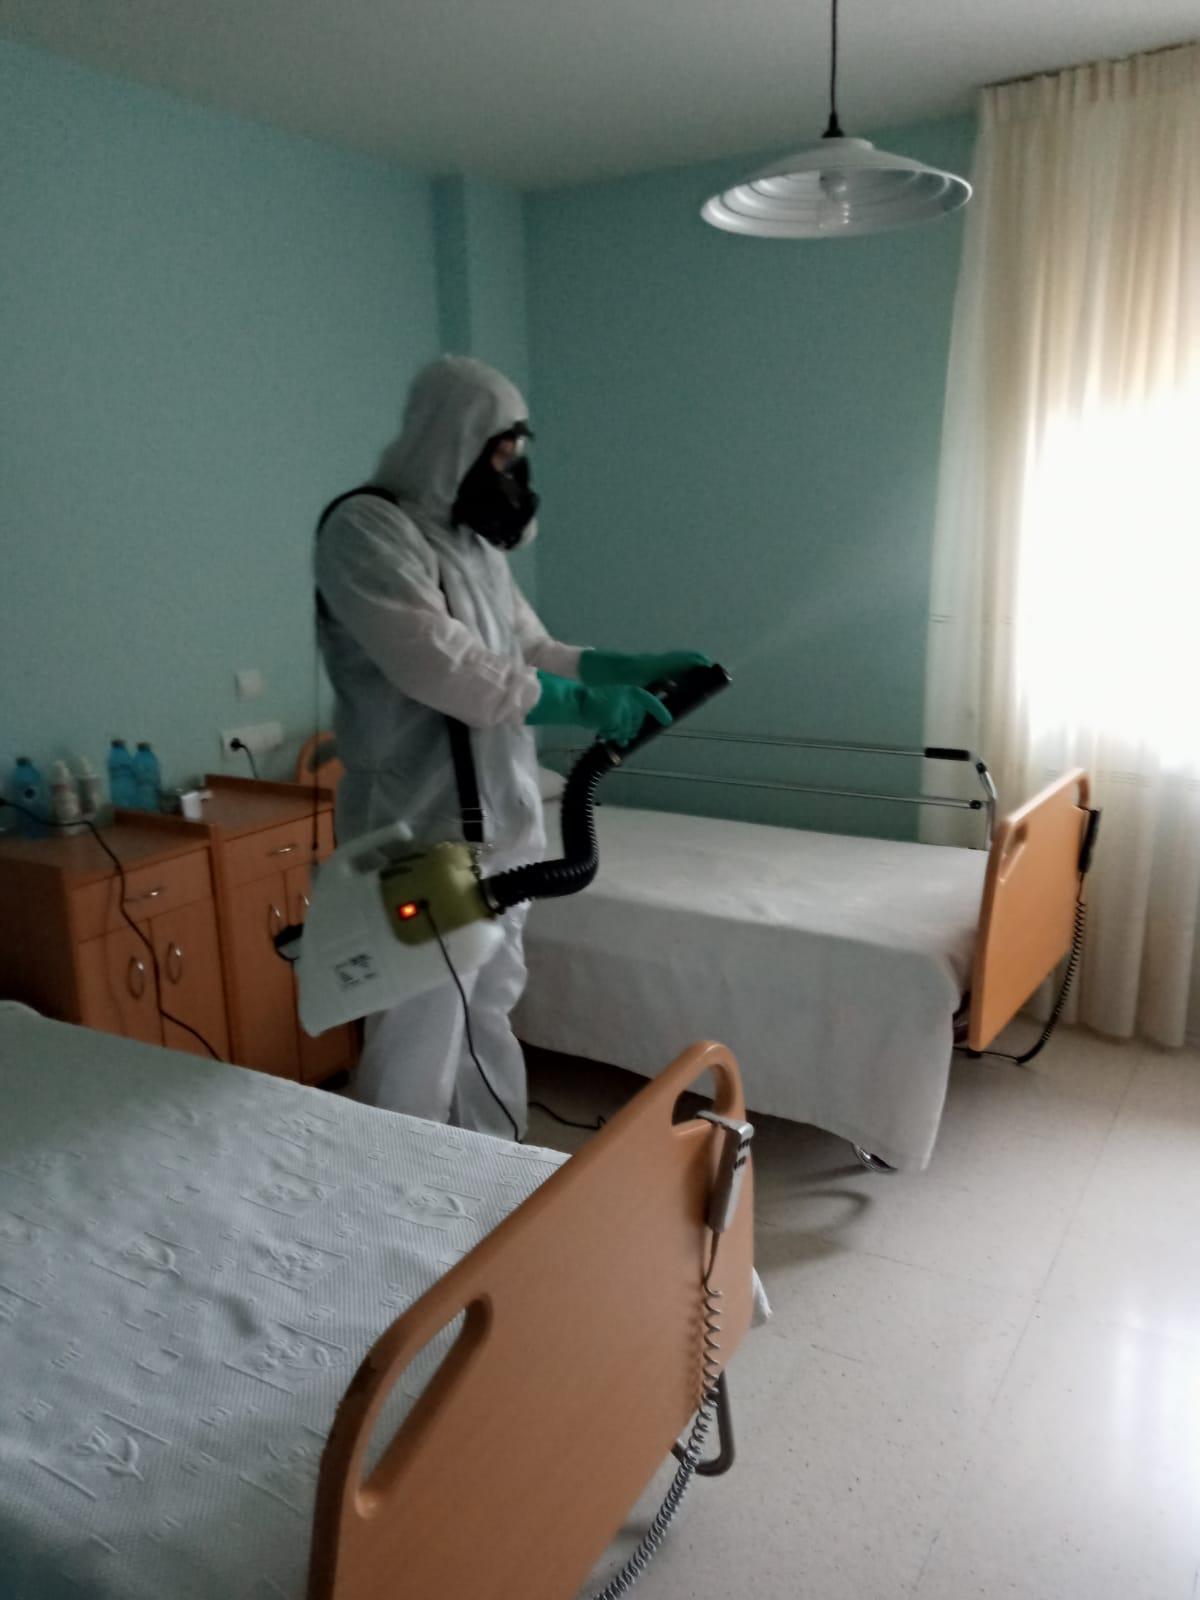 VÍDEO  Así continua la UME desinfectando residencias en León